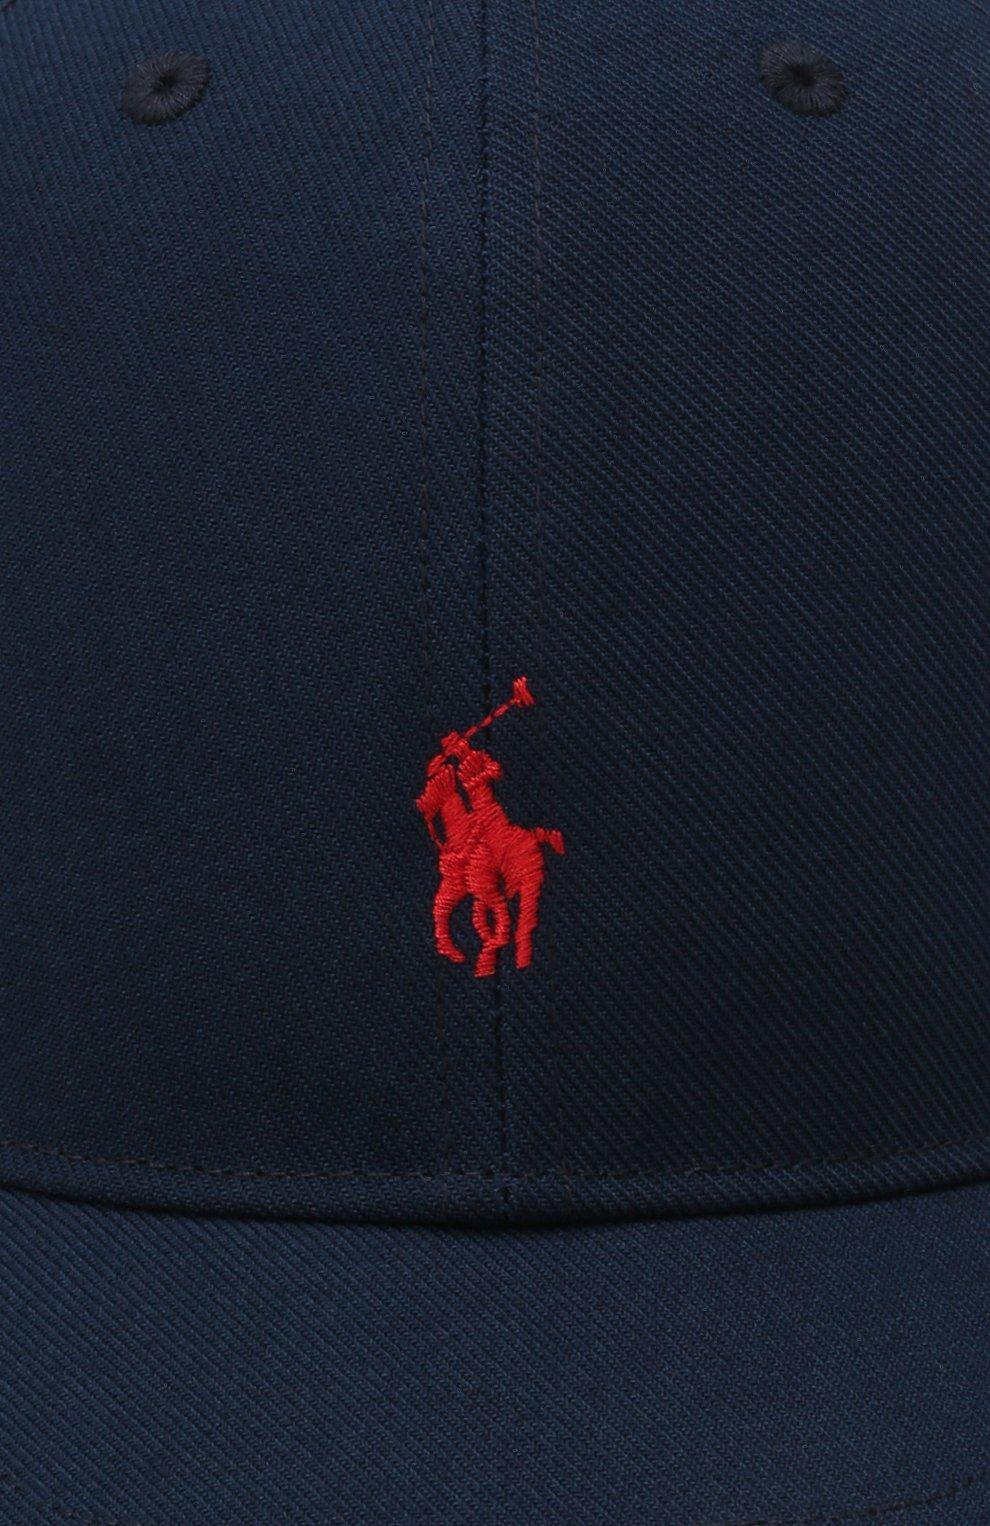 Детская бейсболка POLO RALPH LAUREN темно-синего цвета, арт. 323844896 | Фото 3 (Материал: Текстиль, Синтетический материал)